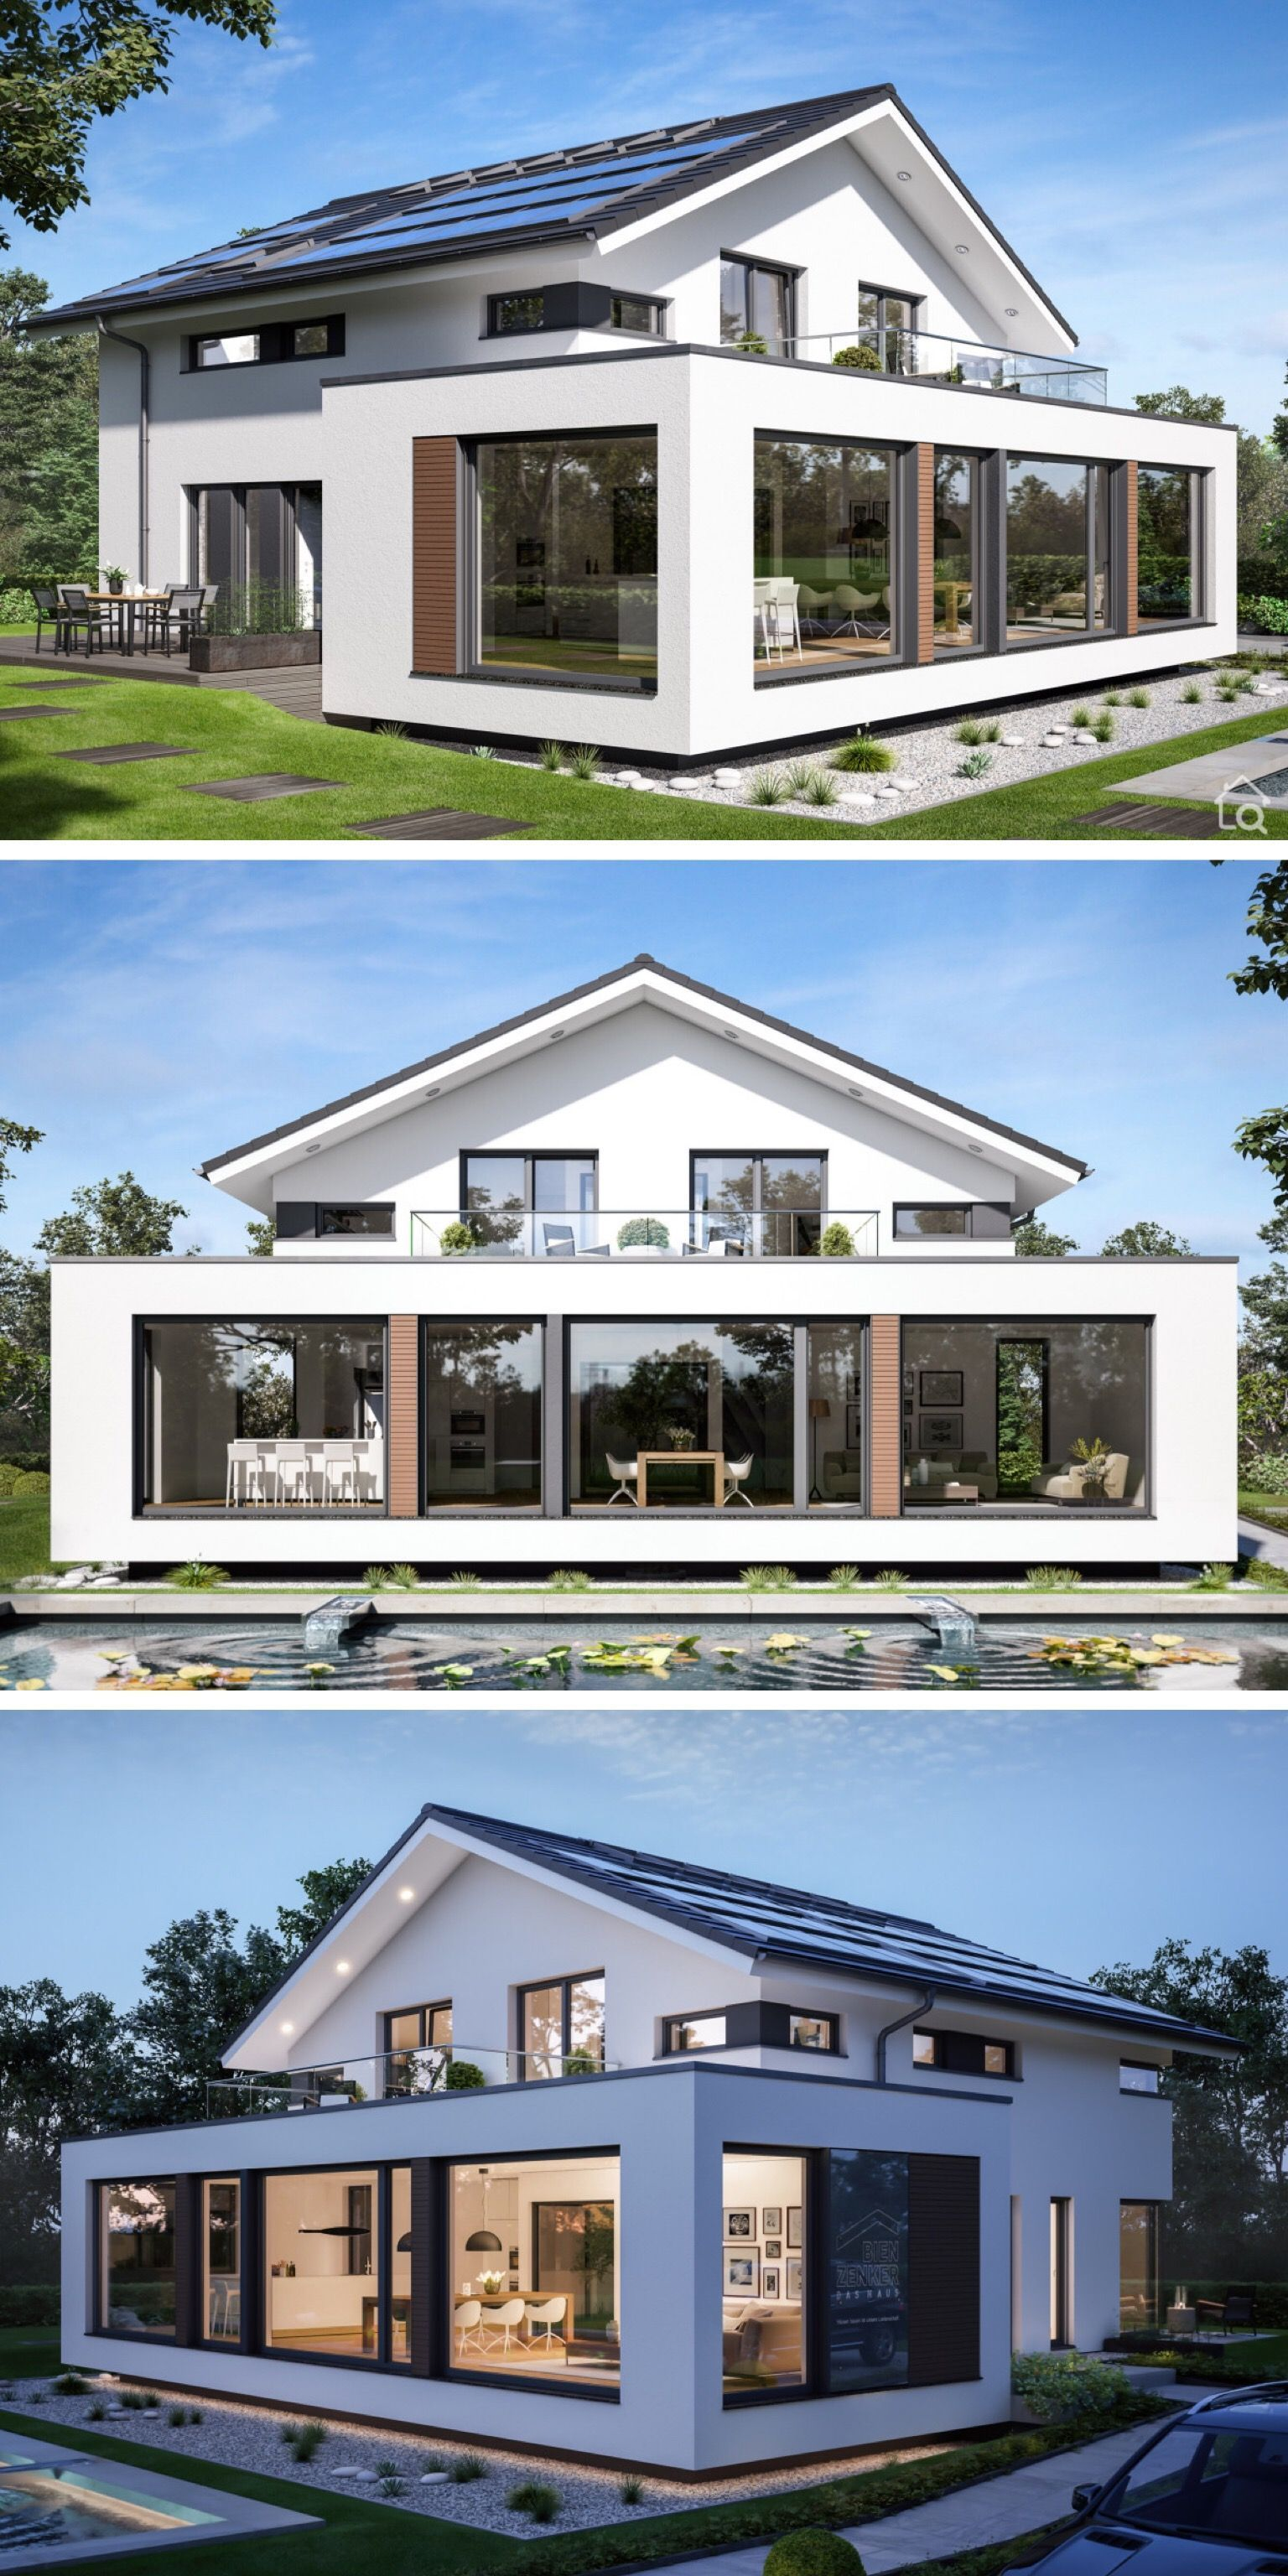 #hausbaudirektde #hausbaudirekt #contemporary #arquitectura #construction   – Architektur haus